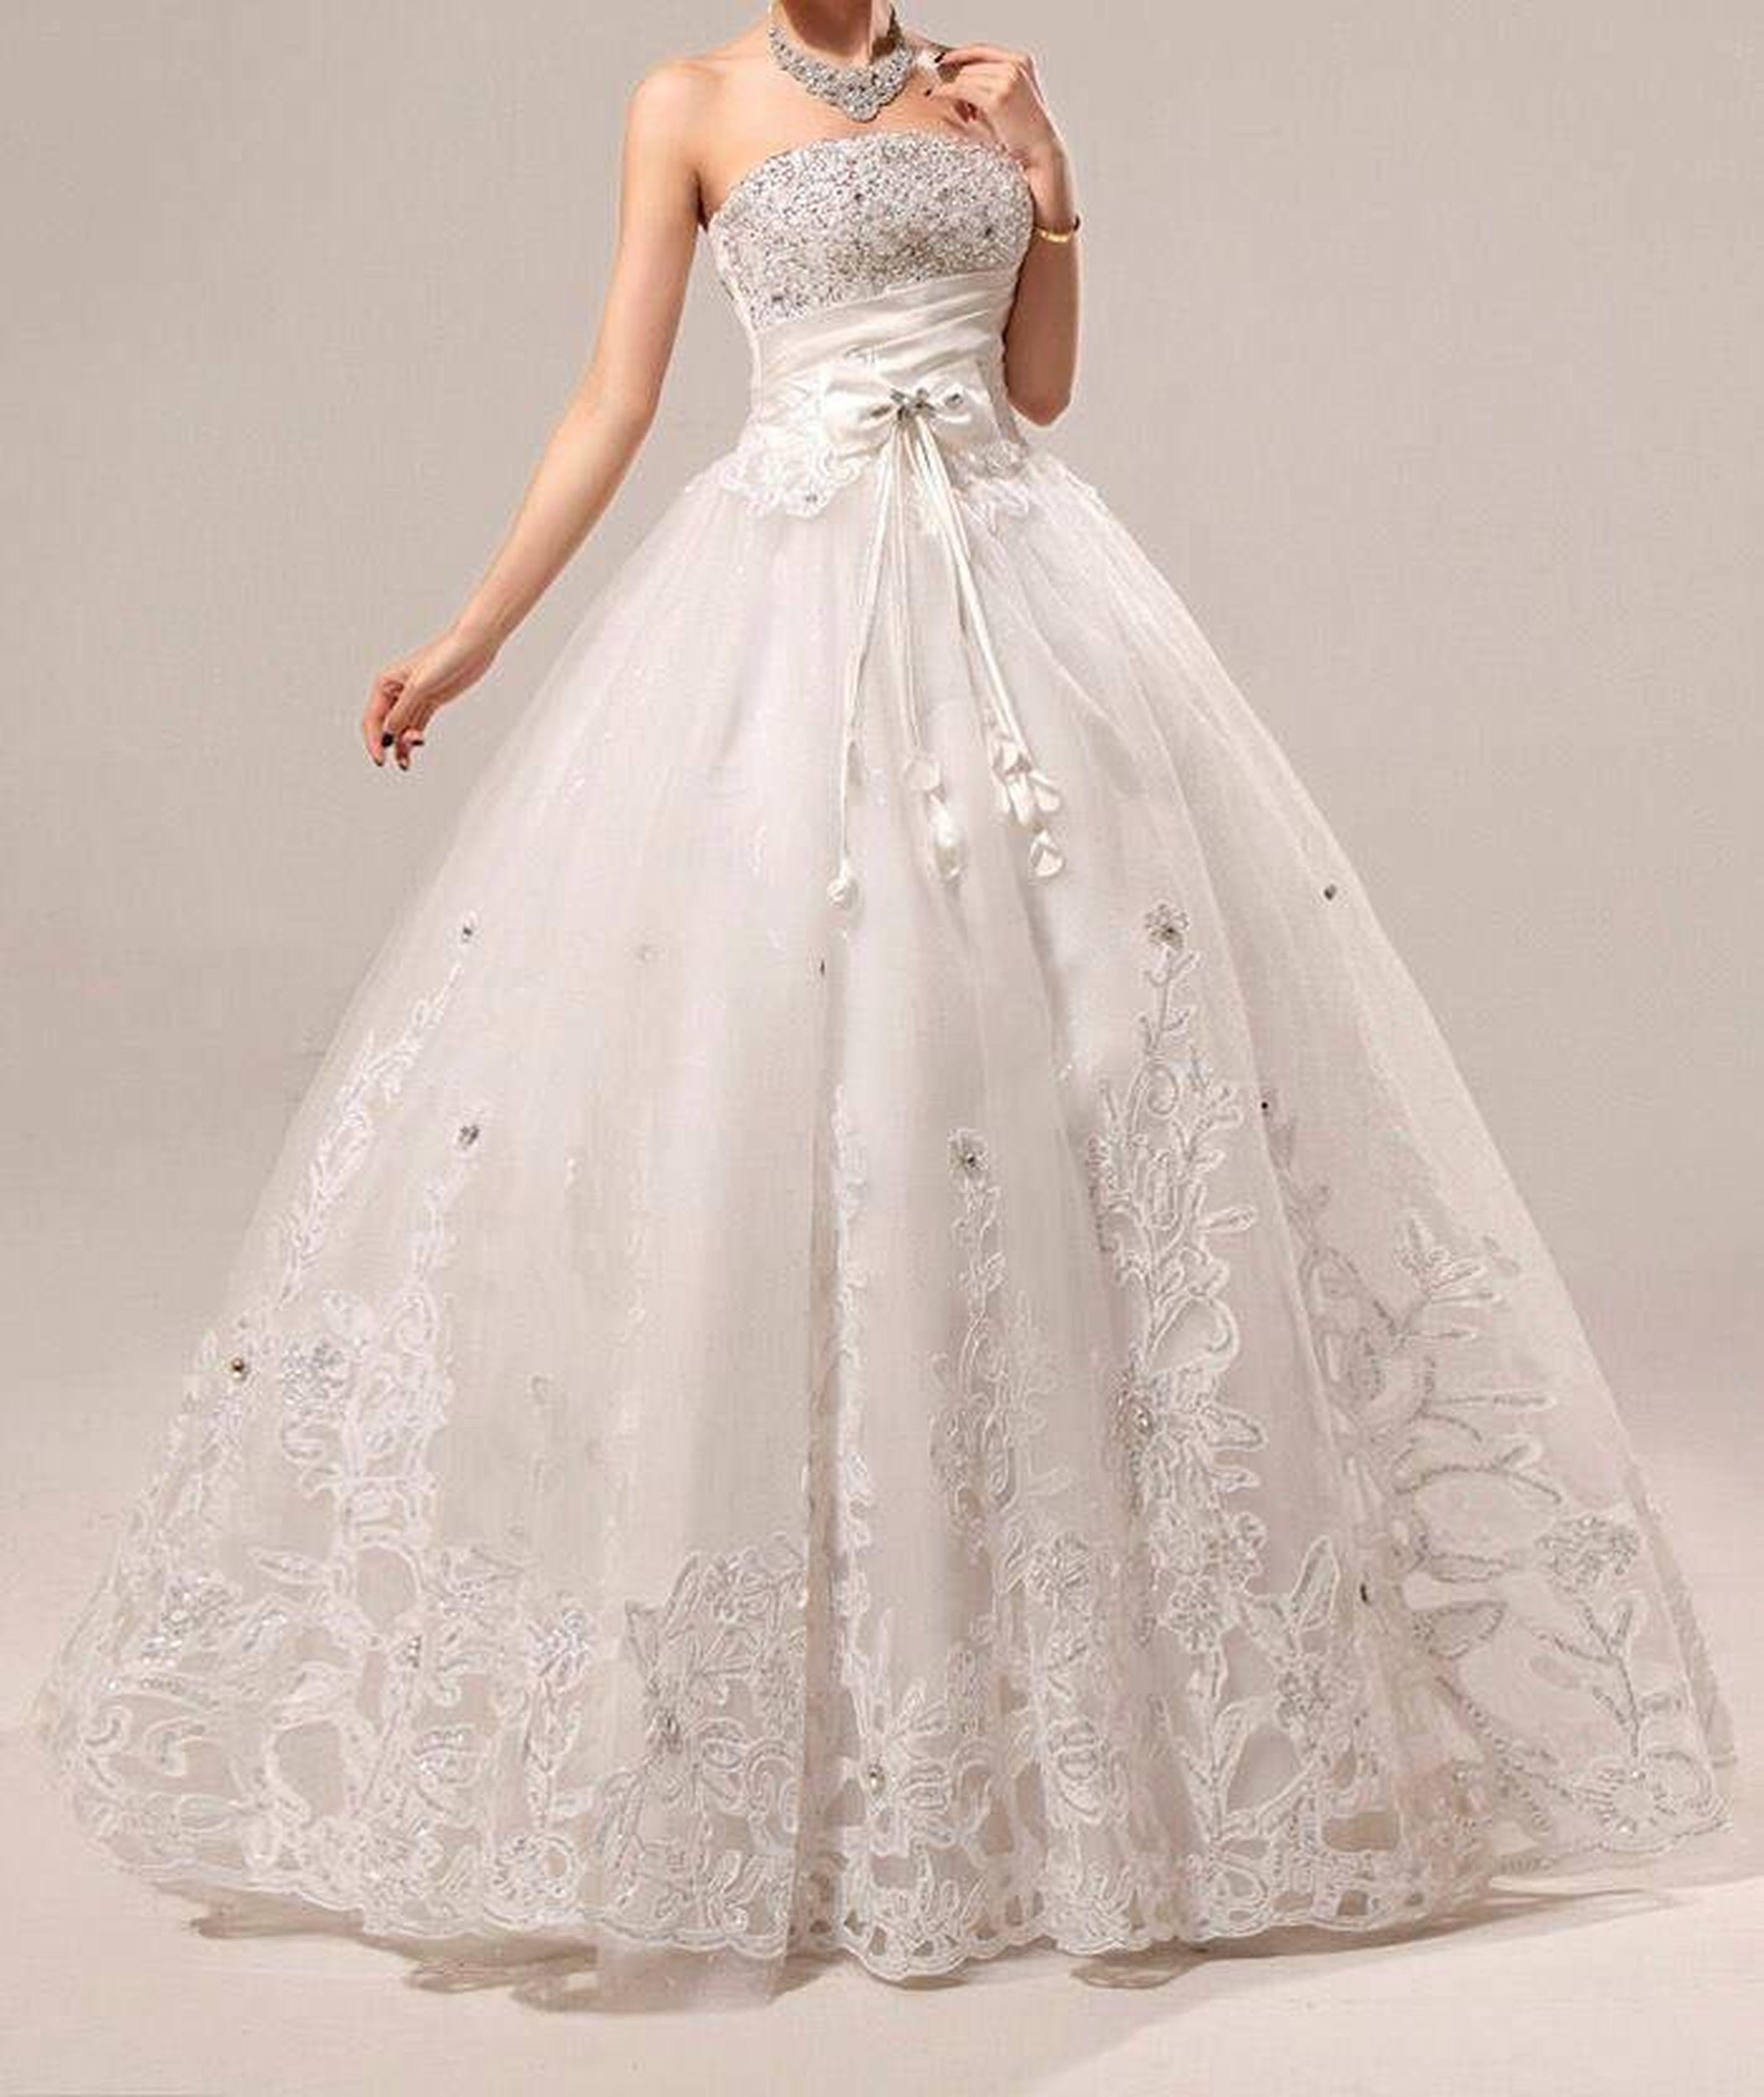 indoors, dress, wedding dress, person, focus on foreground, veil, freshness